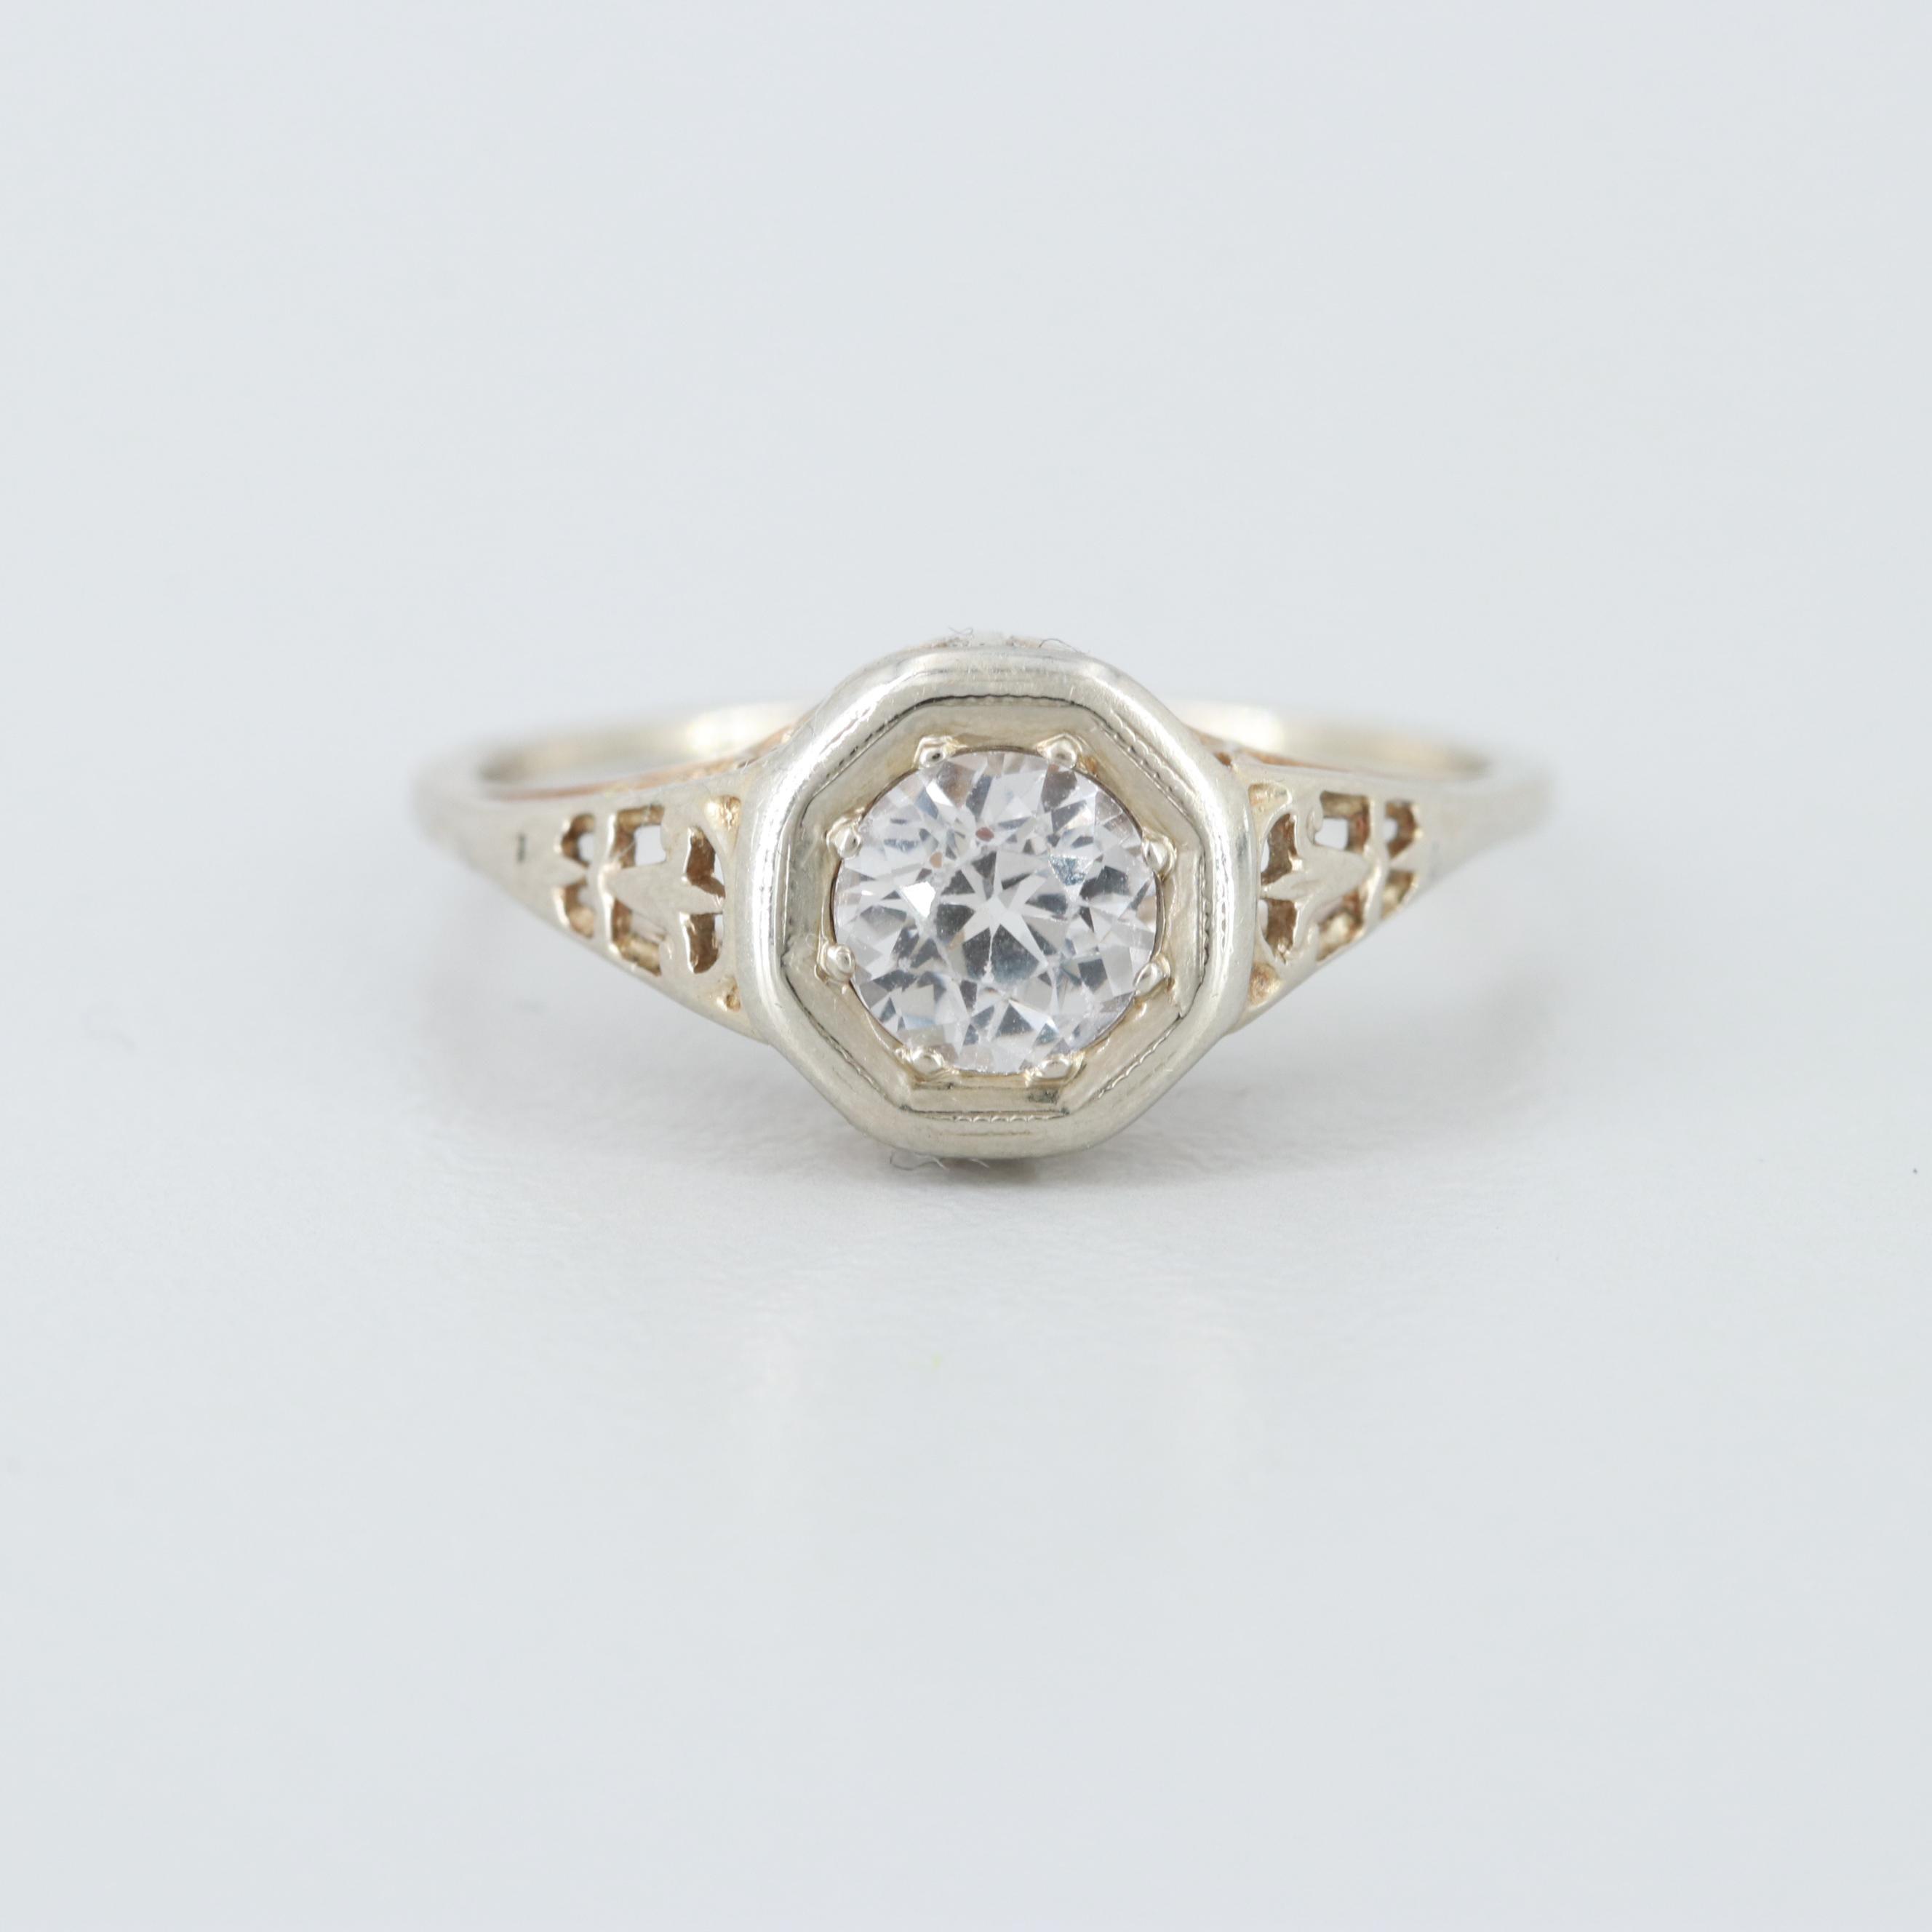 Art Deco 14K White Gold White Sapphire Pierced Lotus Ring